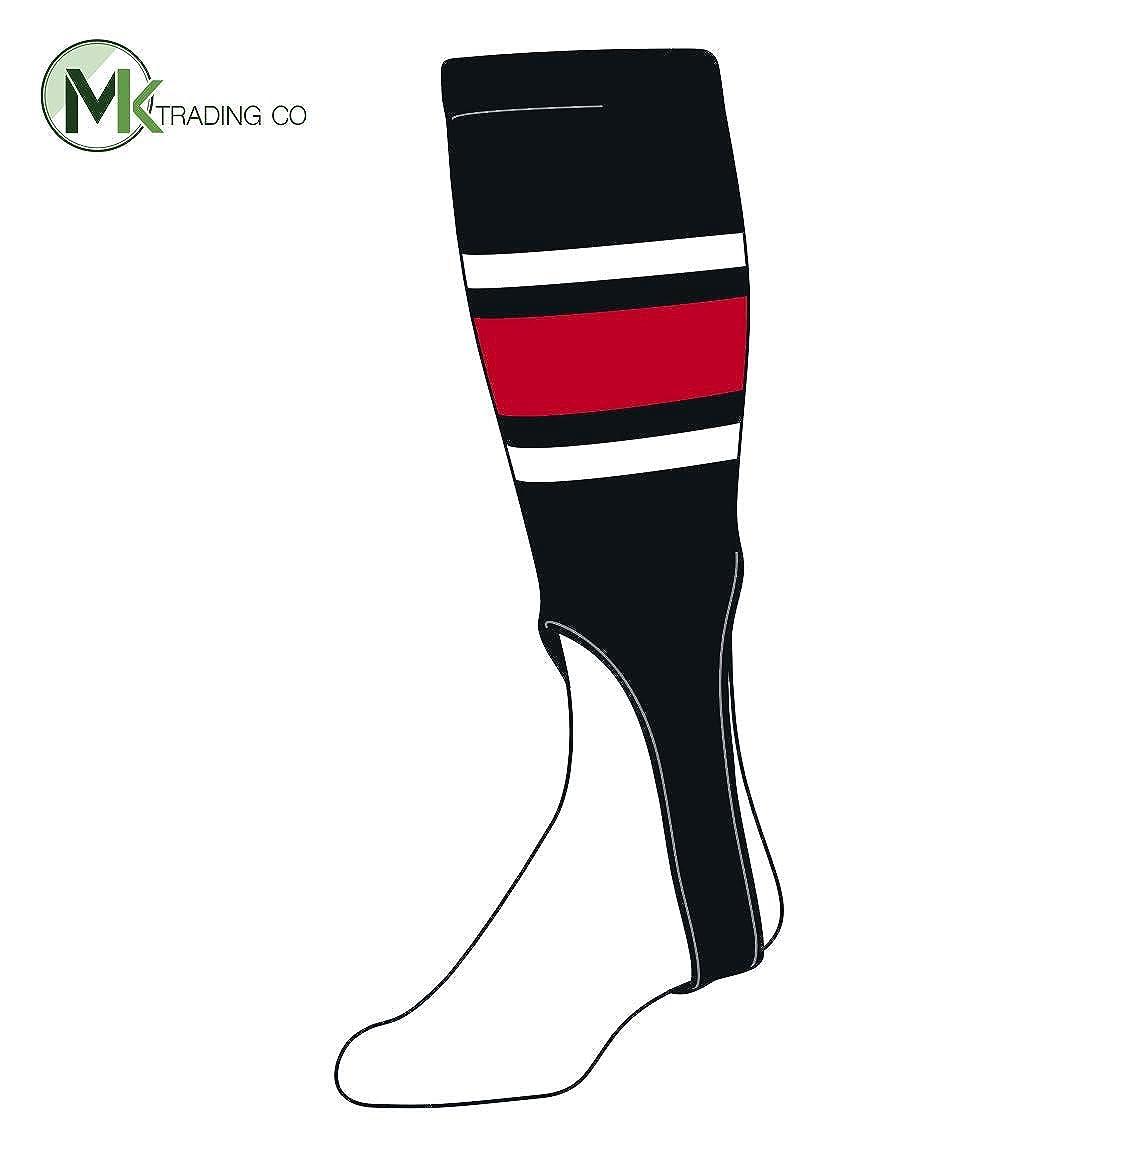 TCK 17 Socks SOCKSHOSIERY SOCKSHOSIERY メンズ US US サイズ: Medium 17 inch (10-15 years) B07NVY77TN, ハーブセンター:2a4487ec --- cgt-tbc.fr